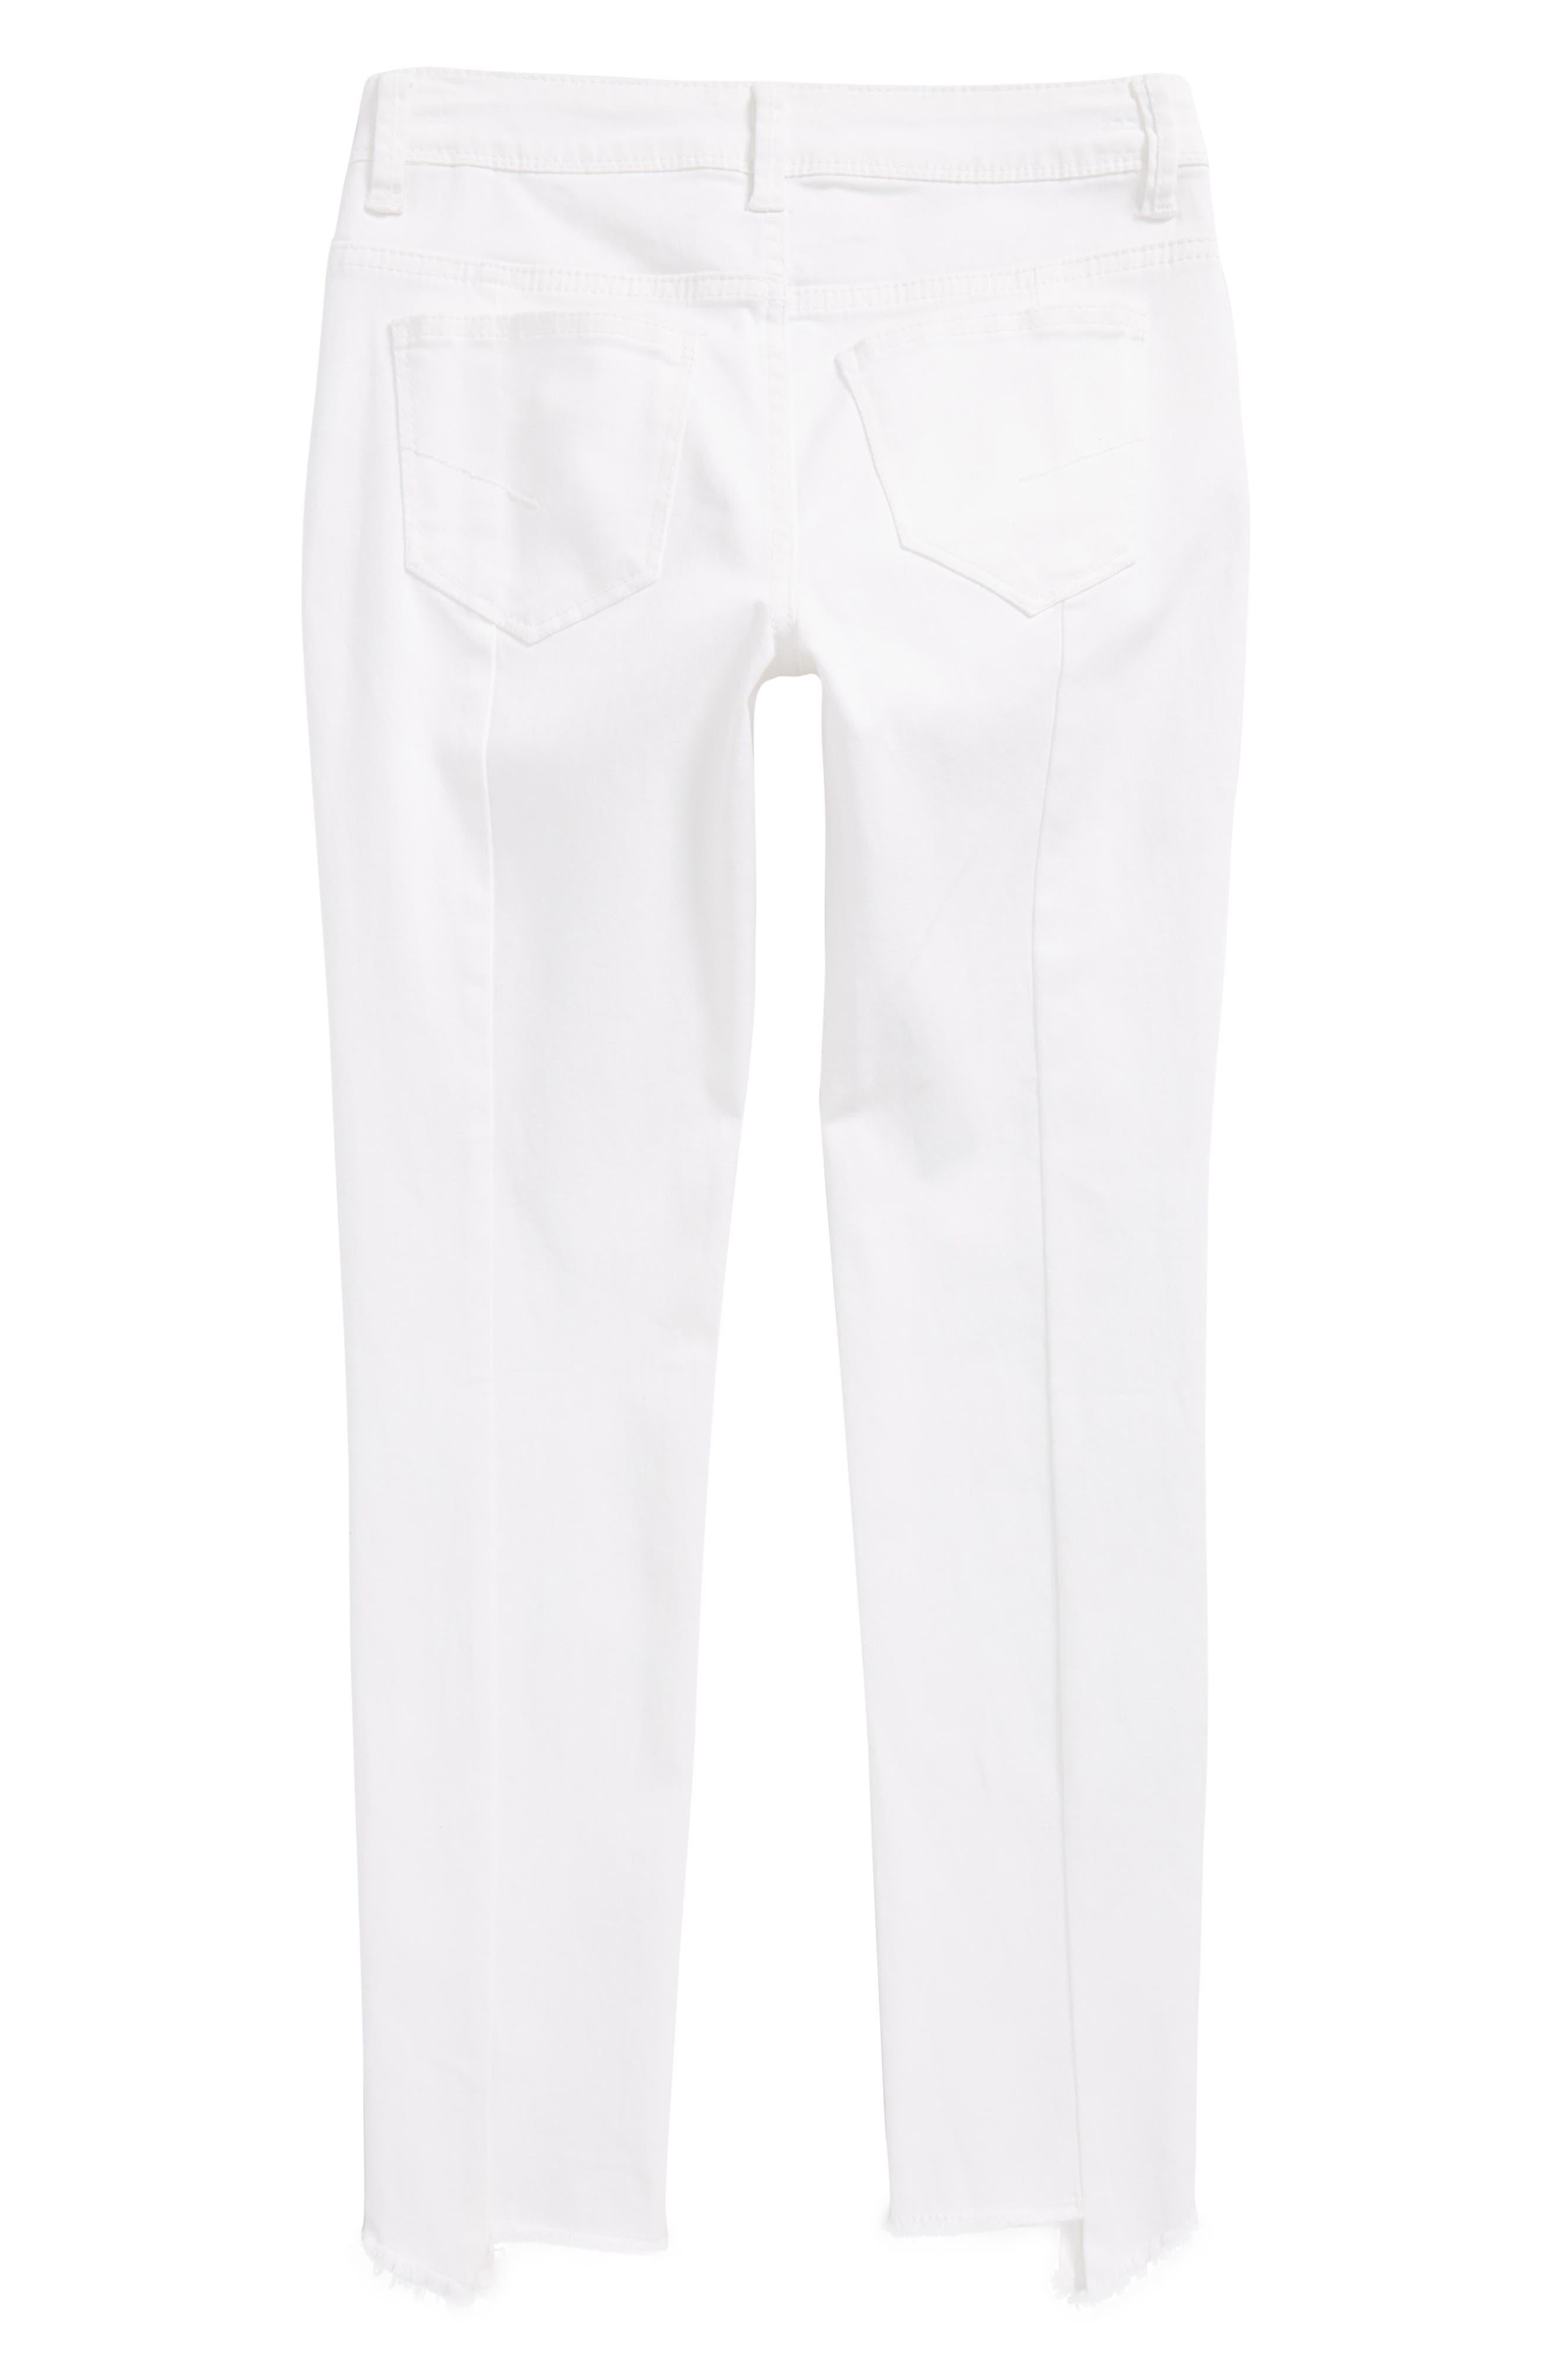 Gigi Skinny Jeans,                             Alternate thumbnail 2, color,                             100